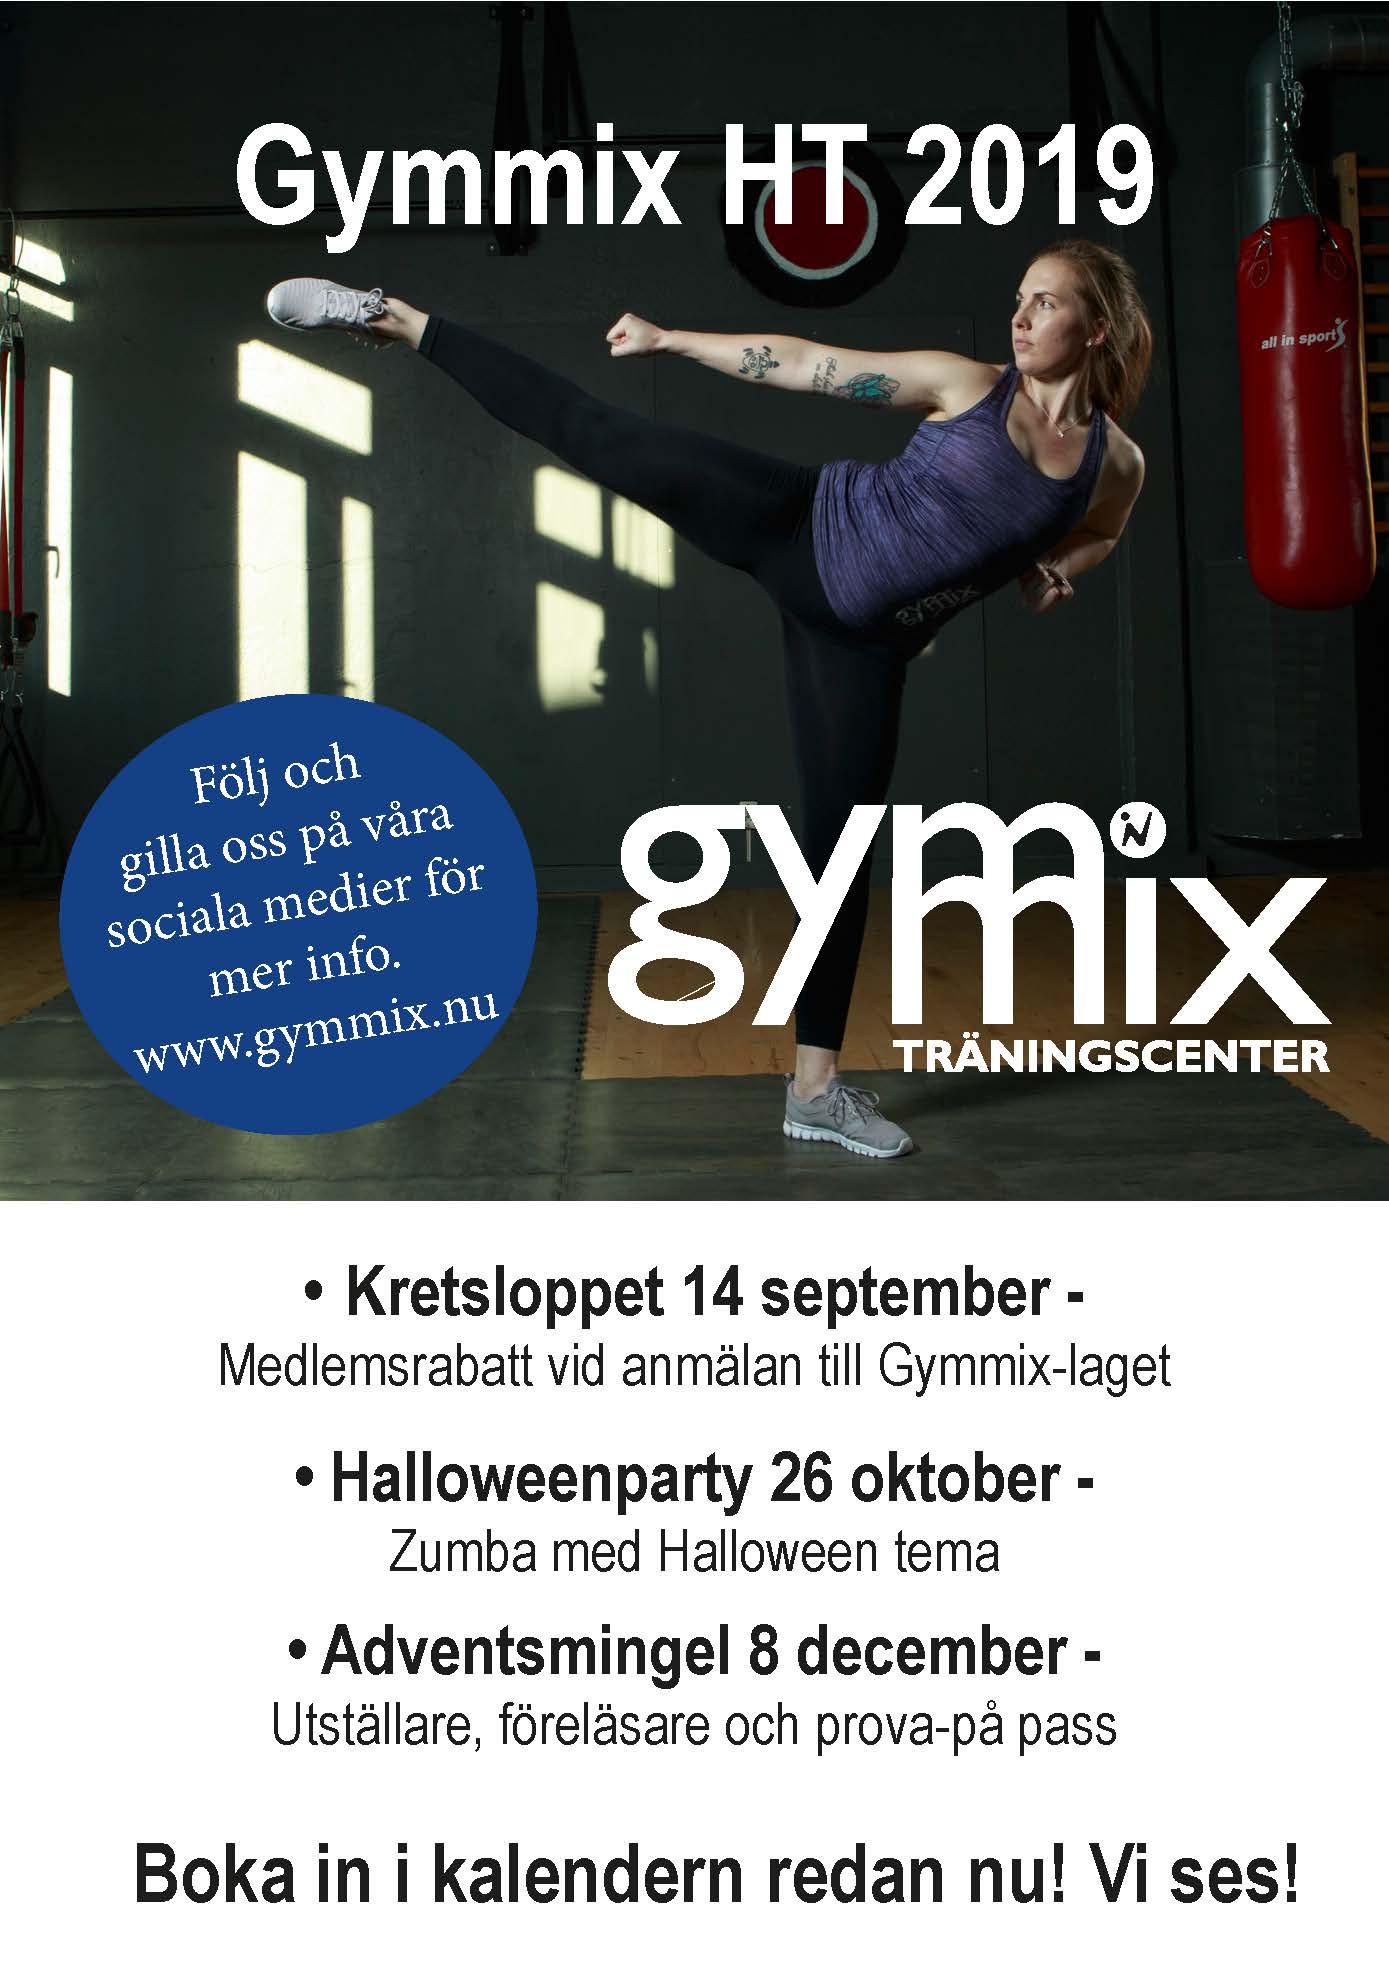 Gymmix aktiviteter HT 2019